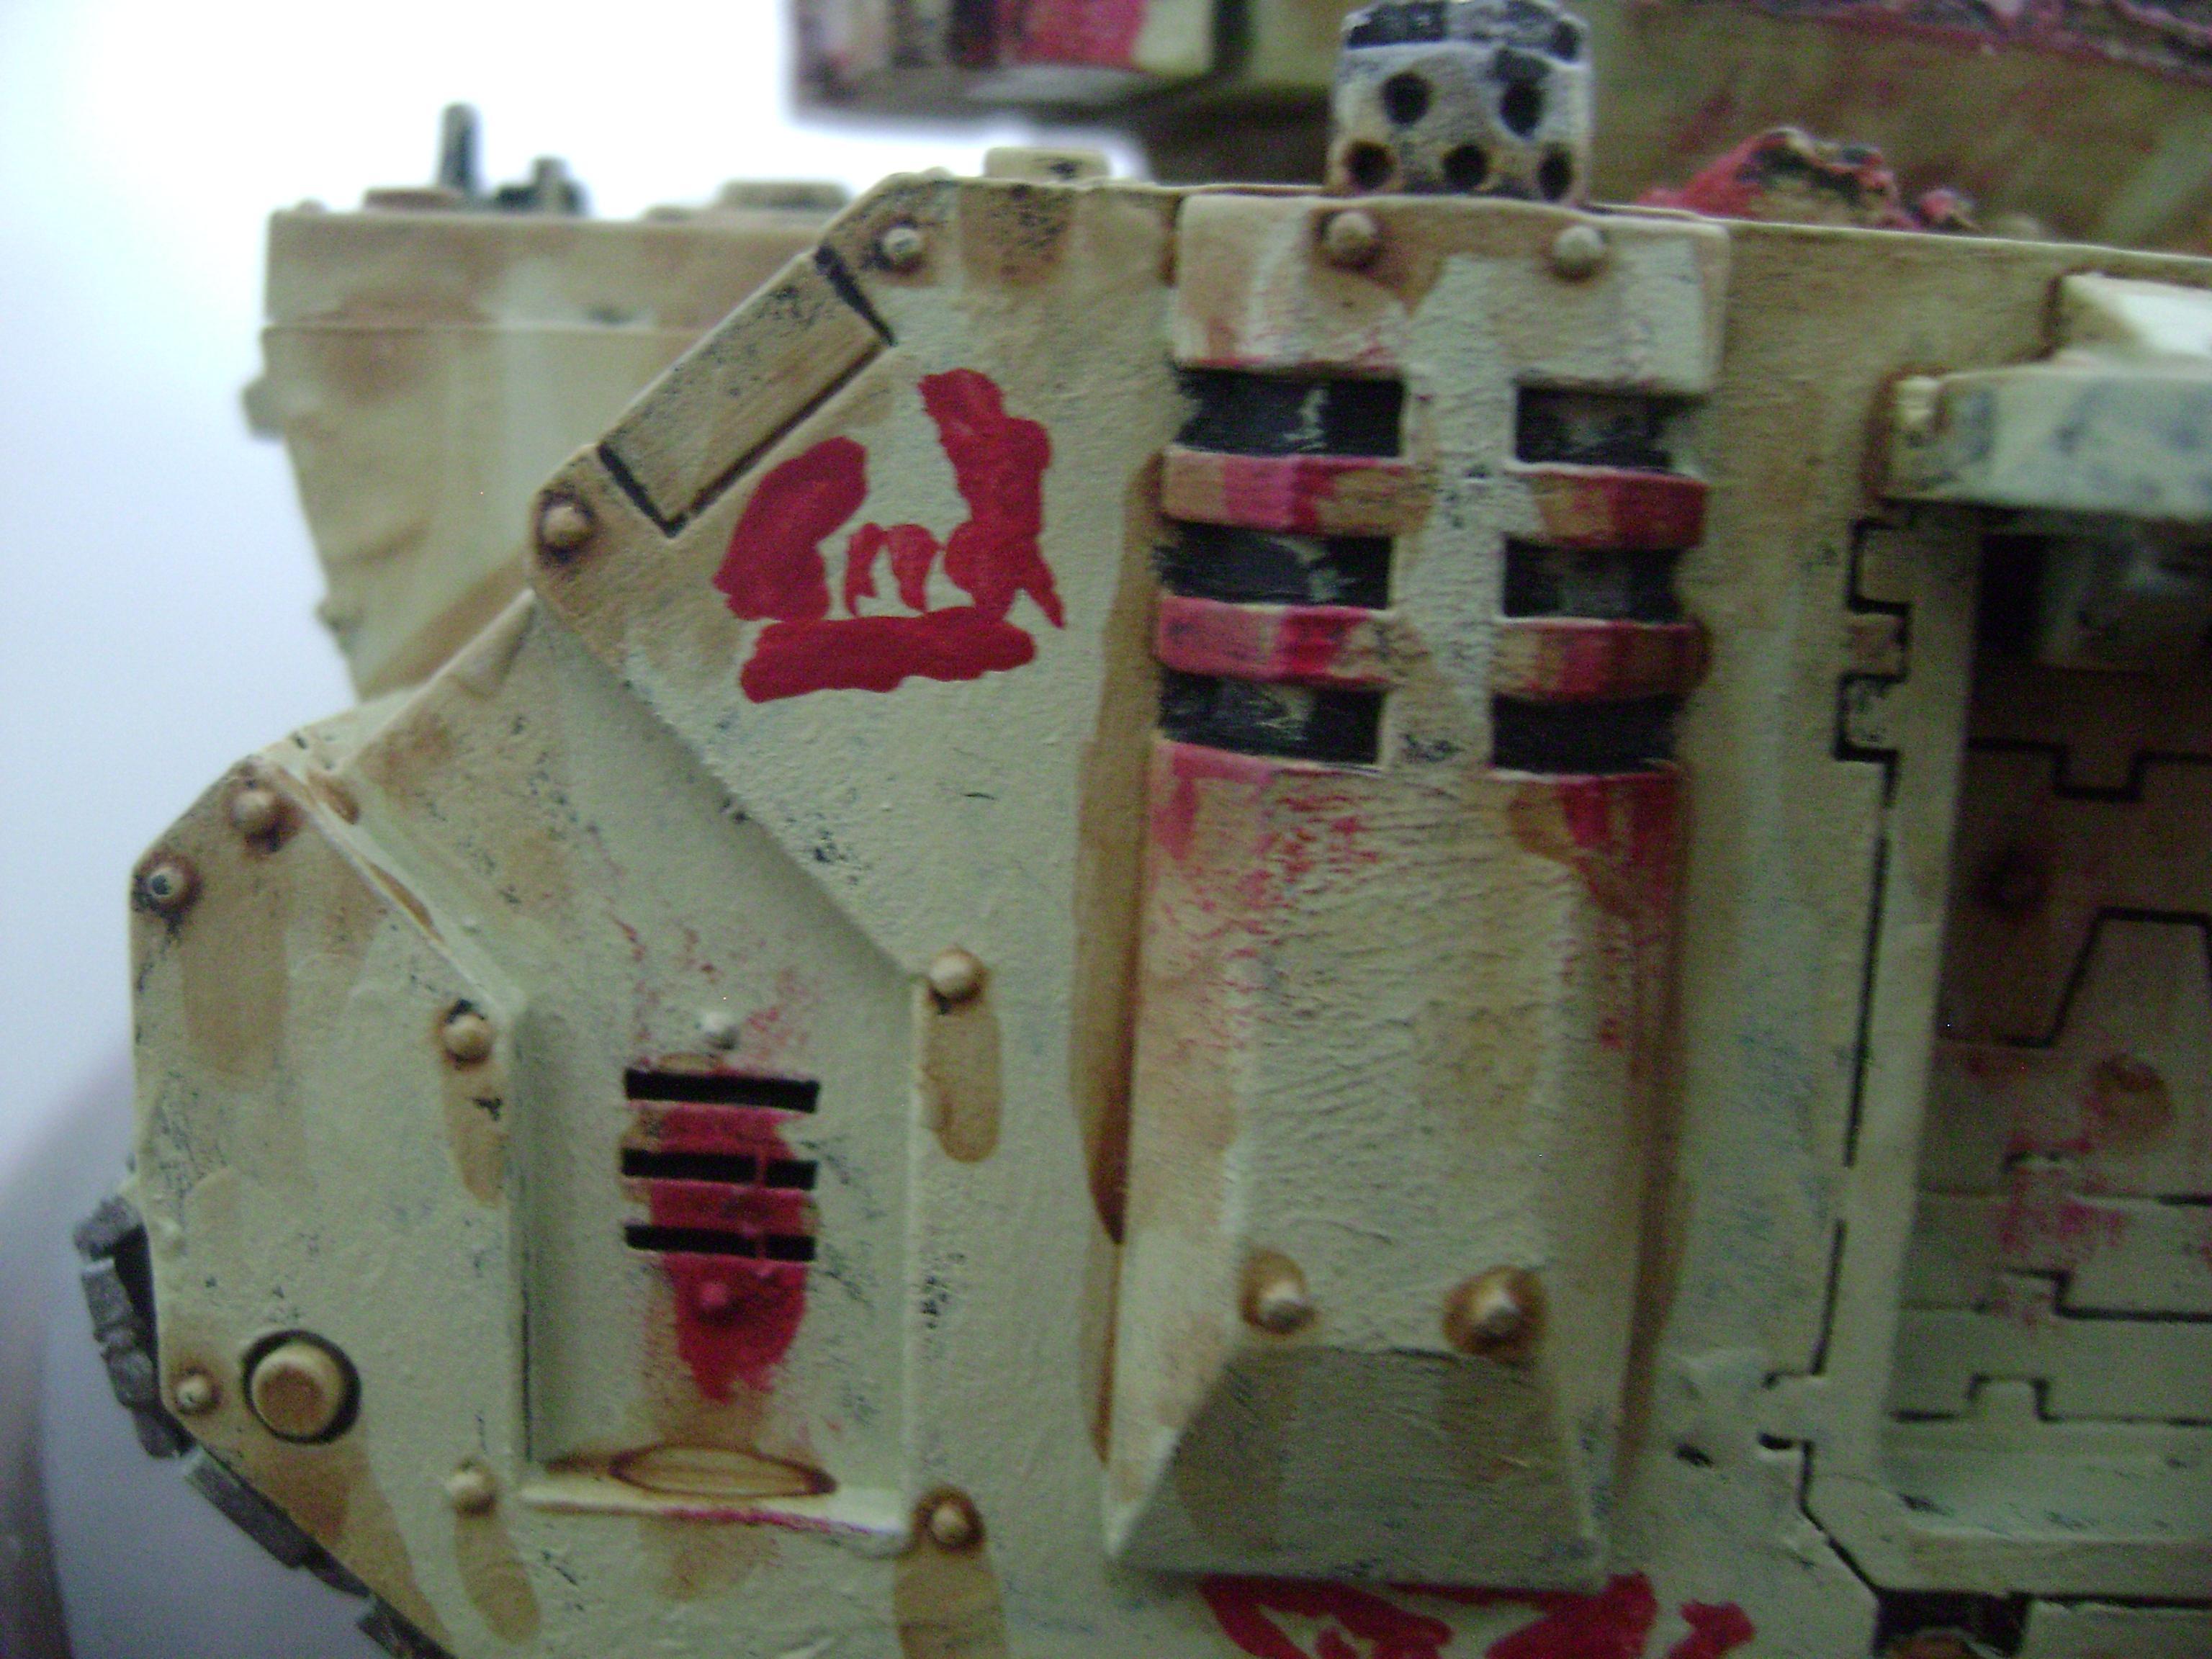 Ork Looted Tank Chaos Space Marine Predator Graffiti